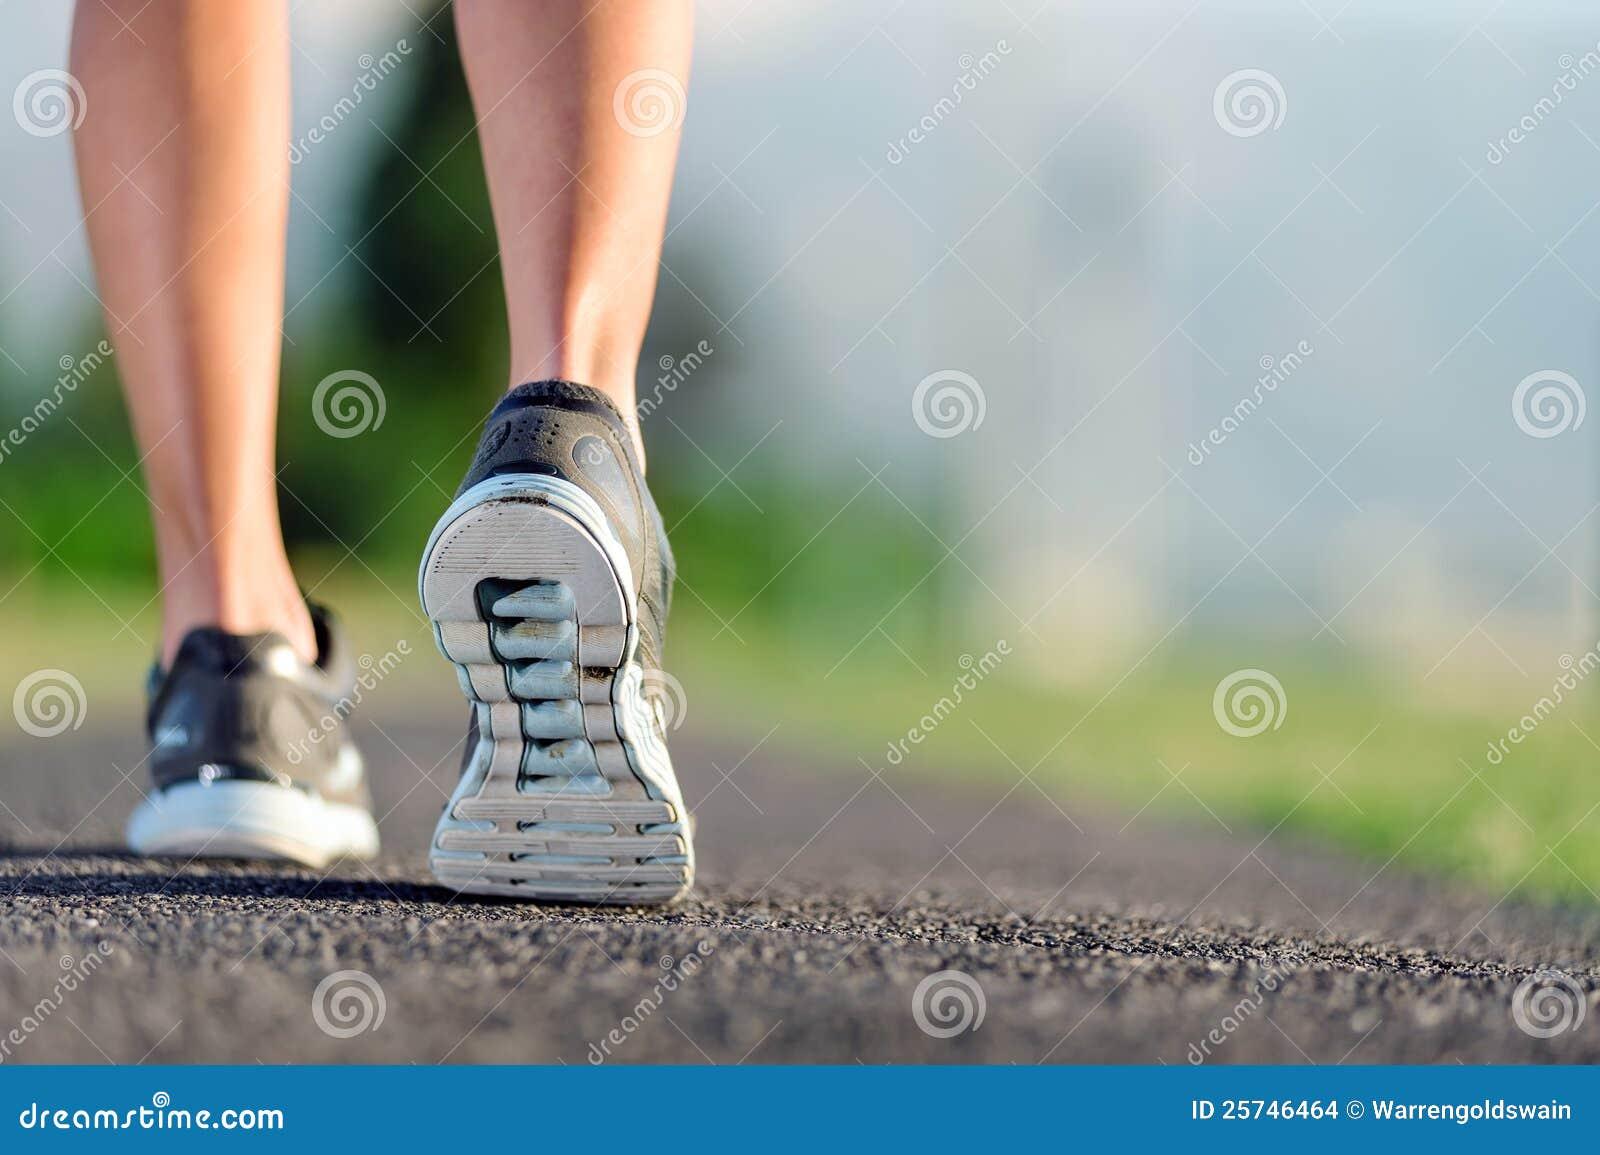 Closeup of feet on pathway